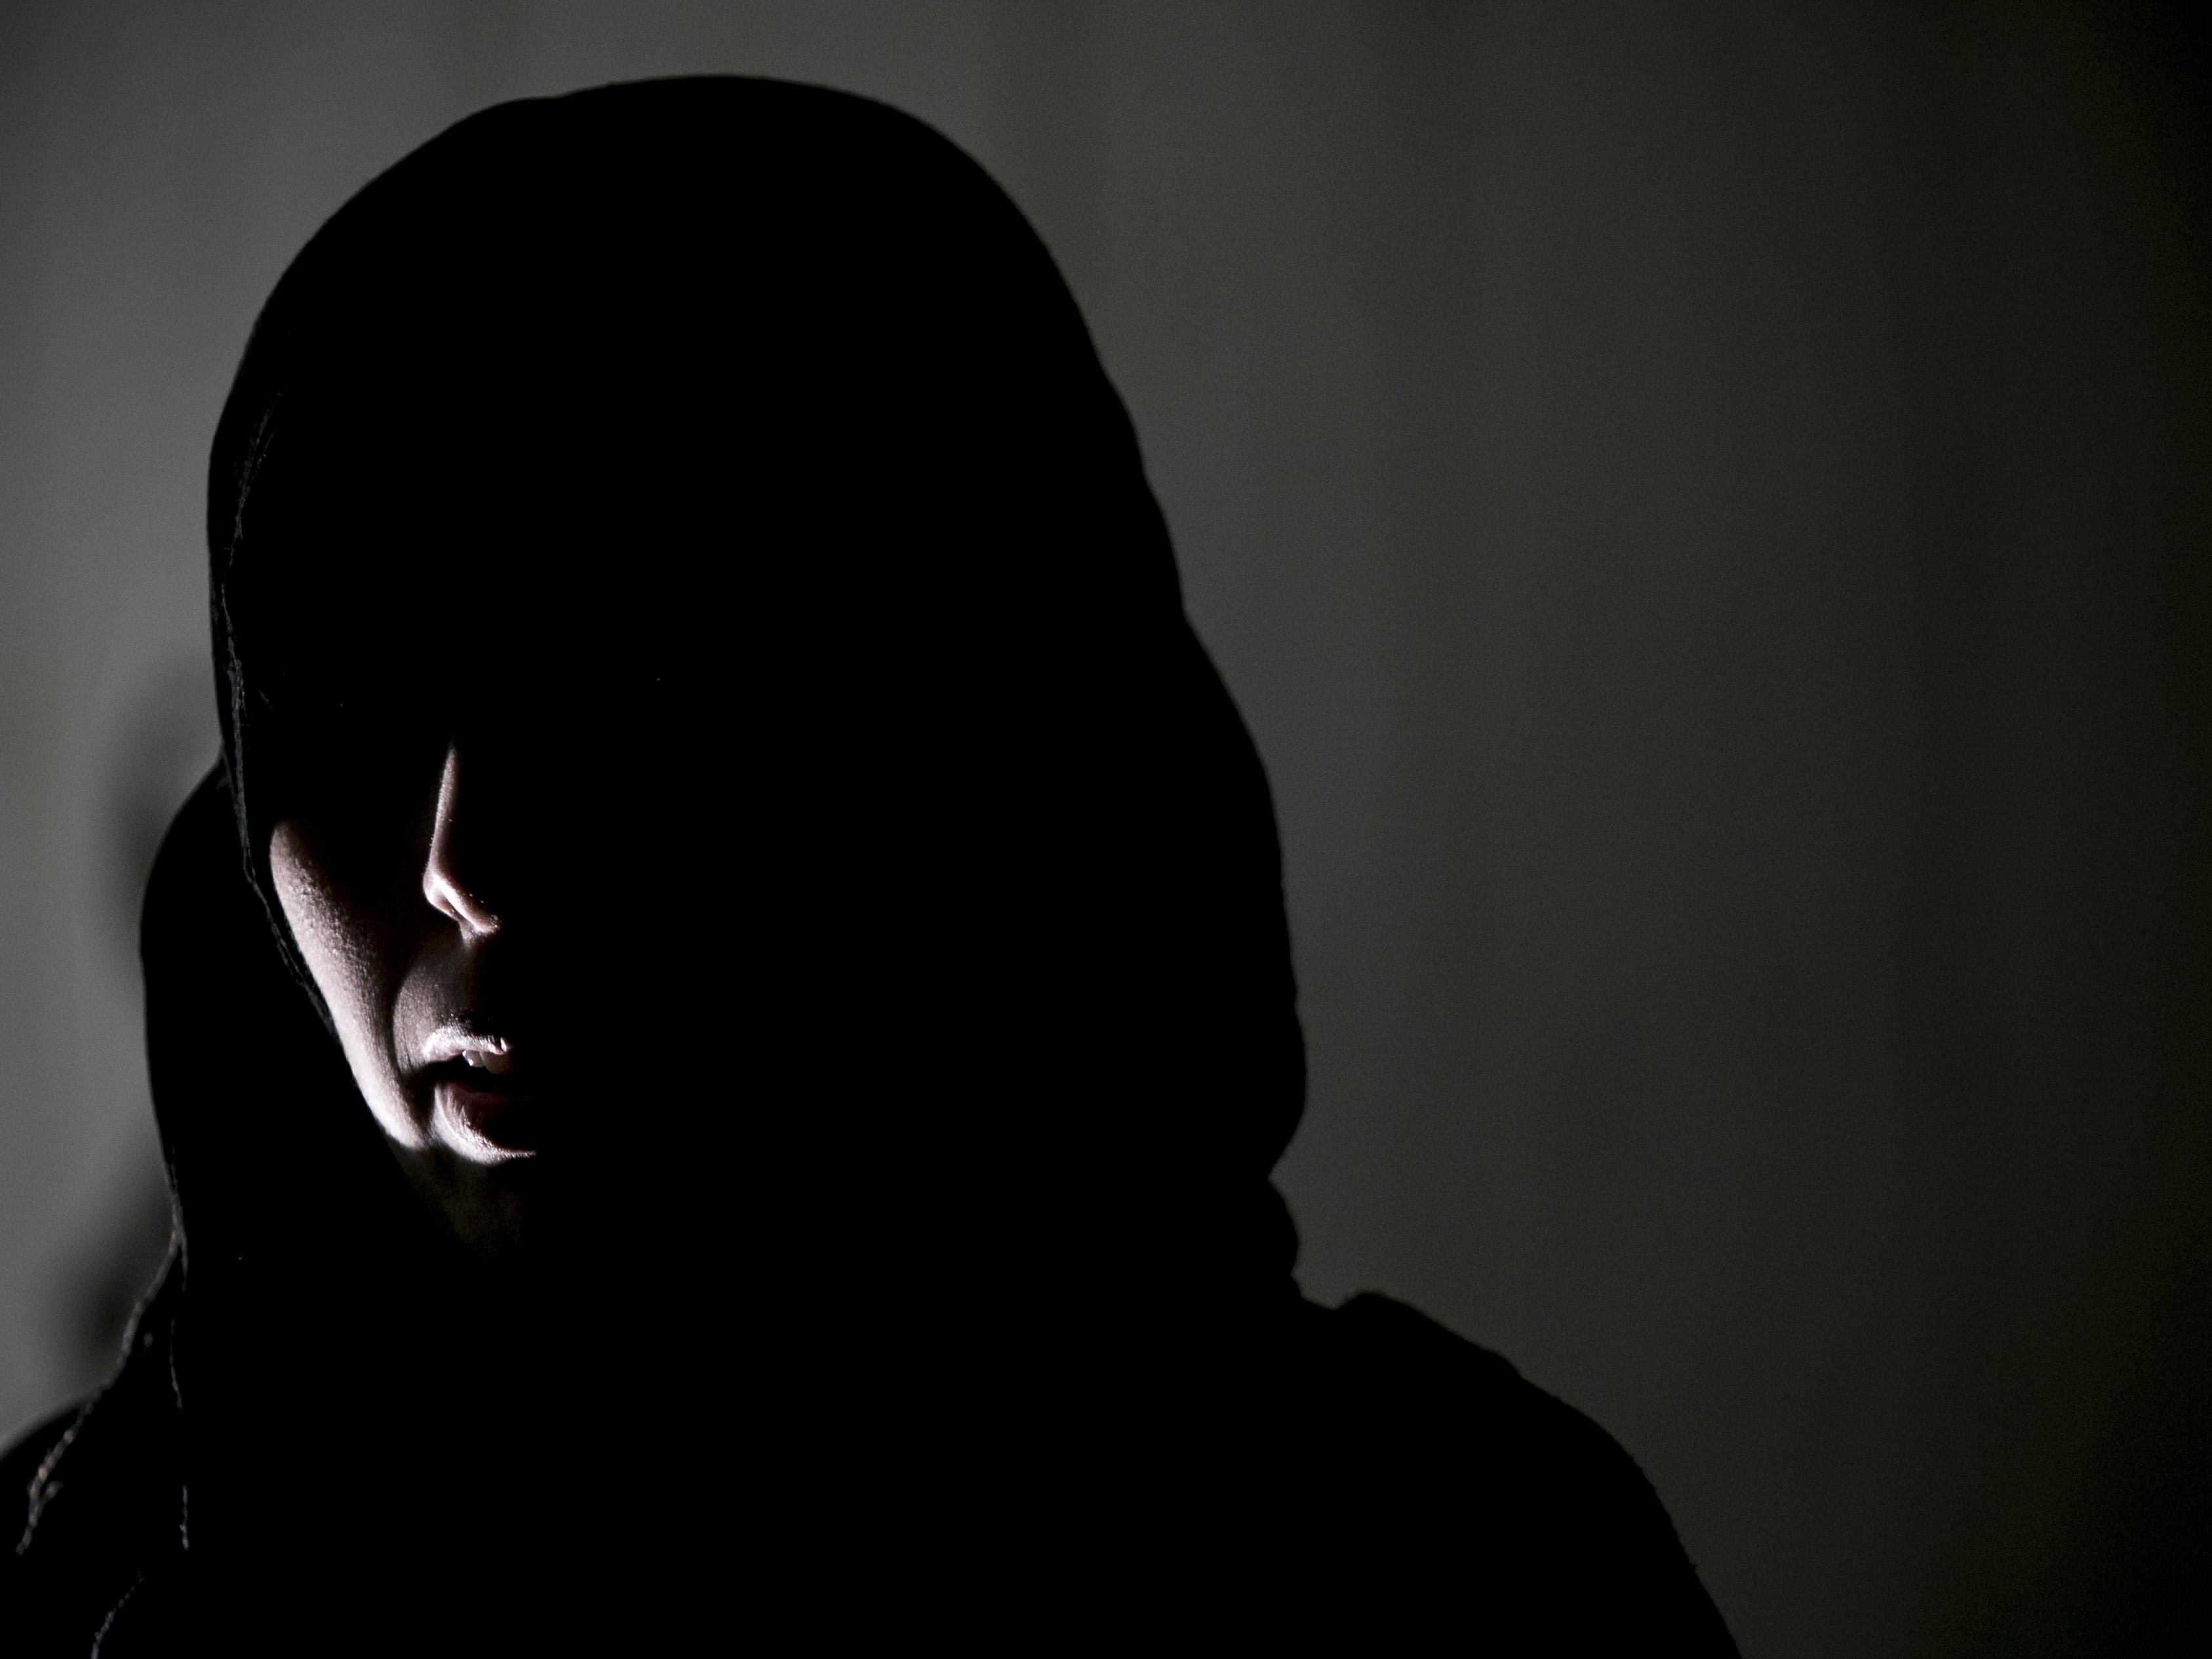 Selma Yahiaoui vit dans la peur depuis l'attentat.